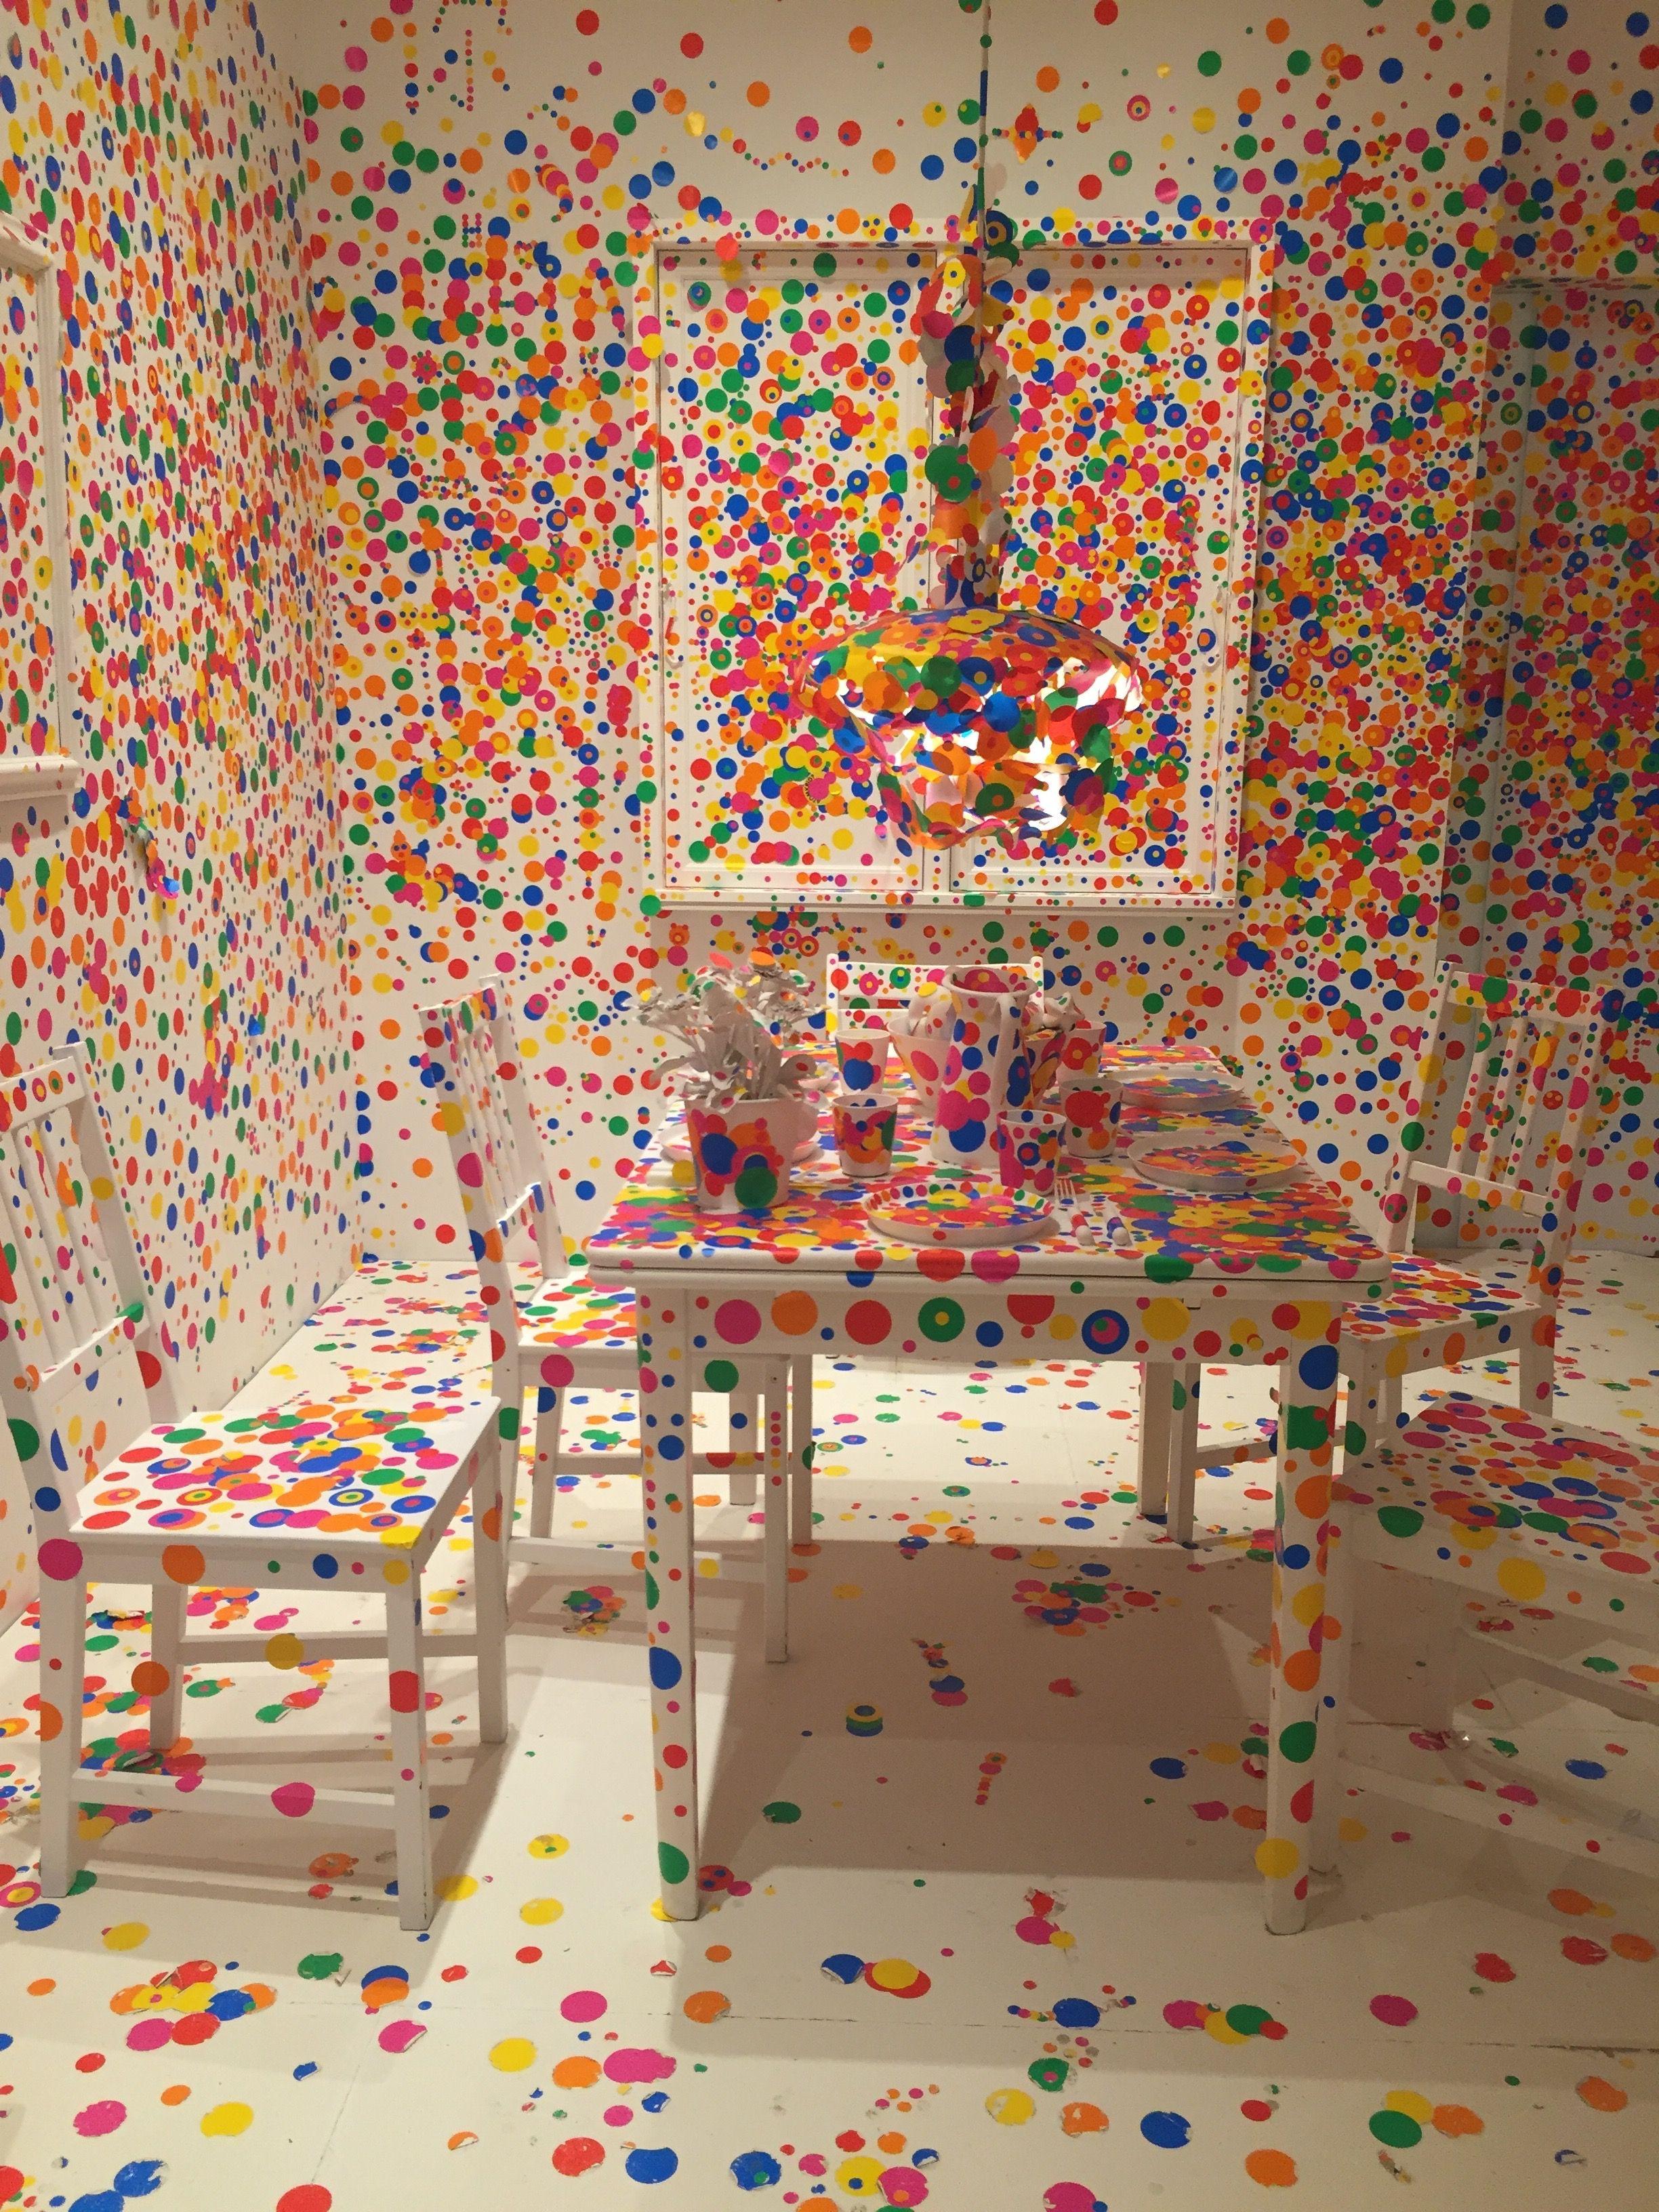 Yayoi Kusama at Louisiana Museum of Modern Art, Copenhagen